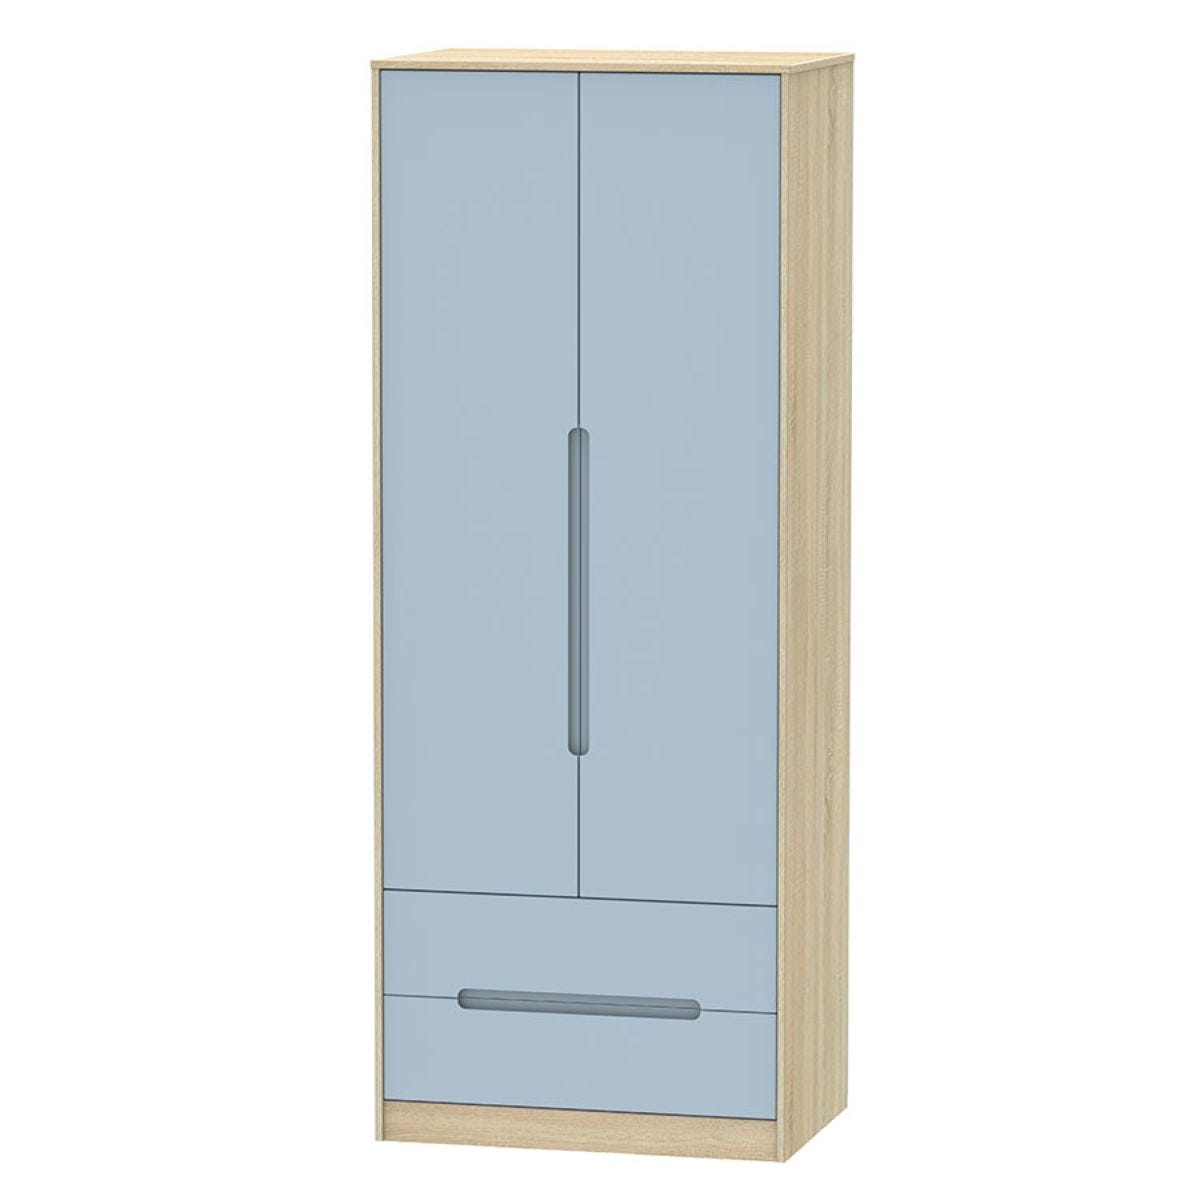 Barquero Tall 2-Door Wardrobe with Drawers - Pine/White Gloss